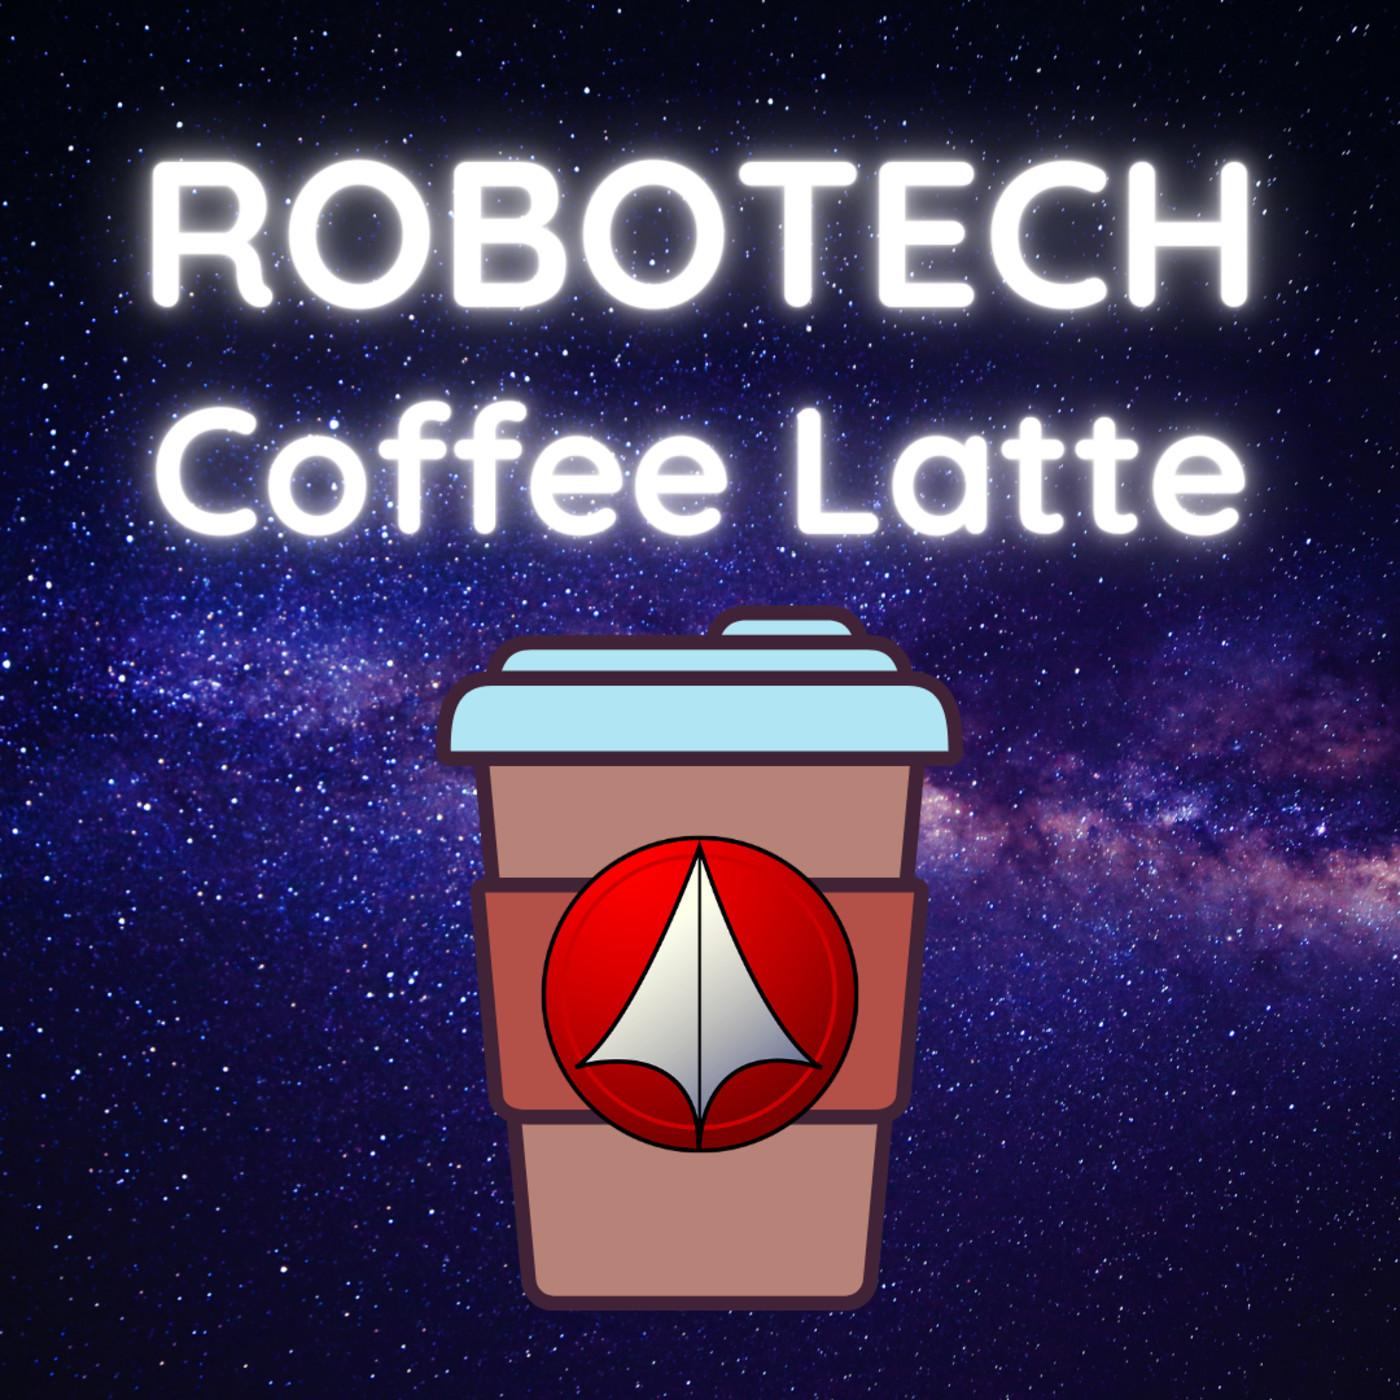 ROBOTECH Coffee Latte - Cap 1